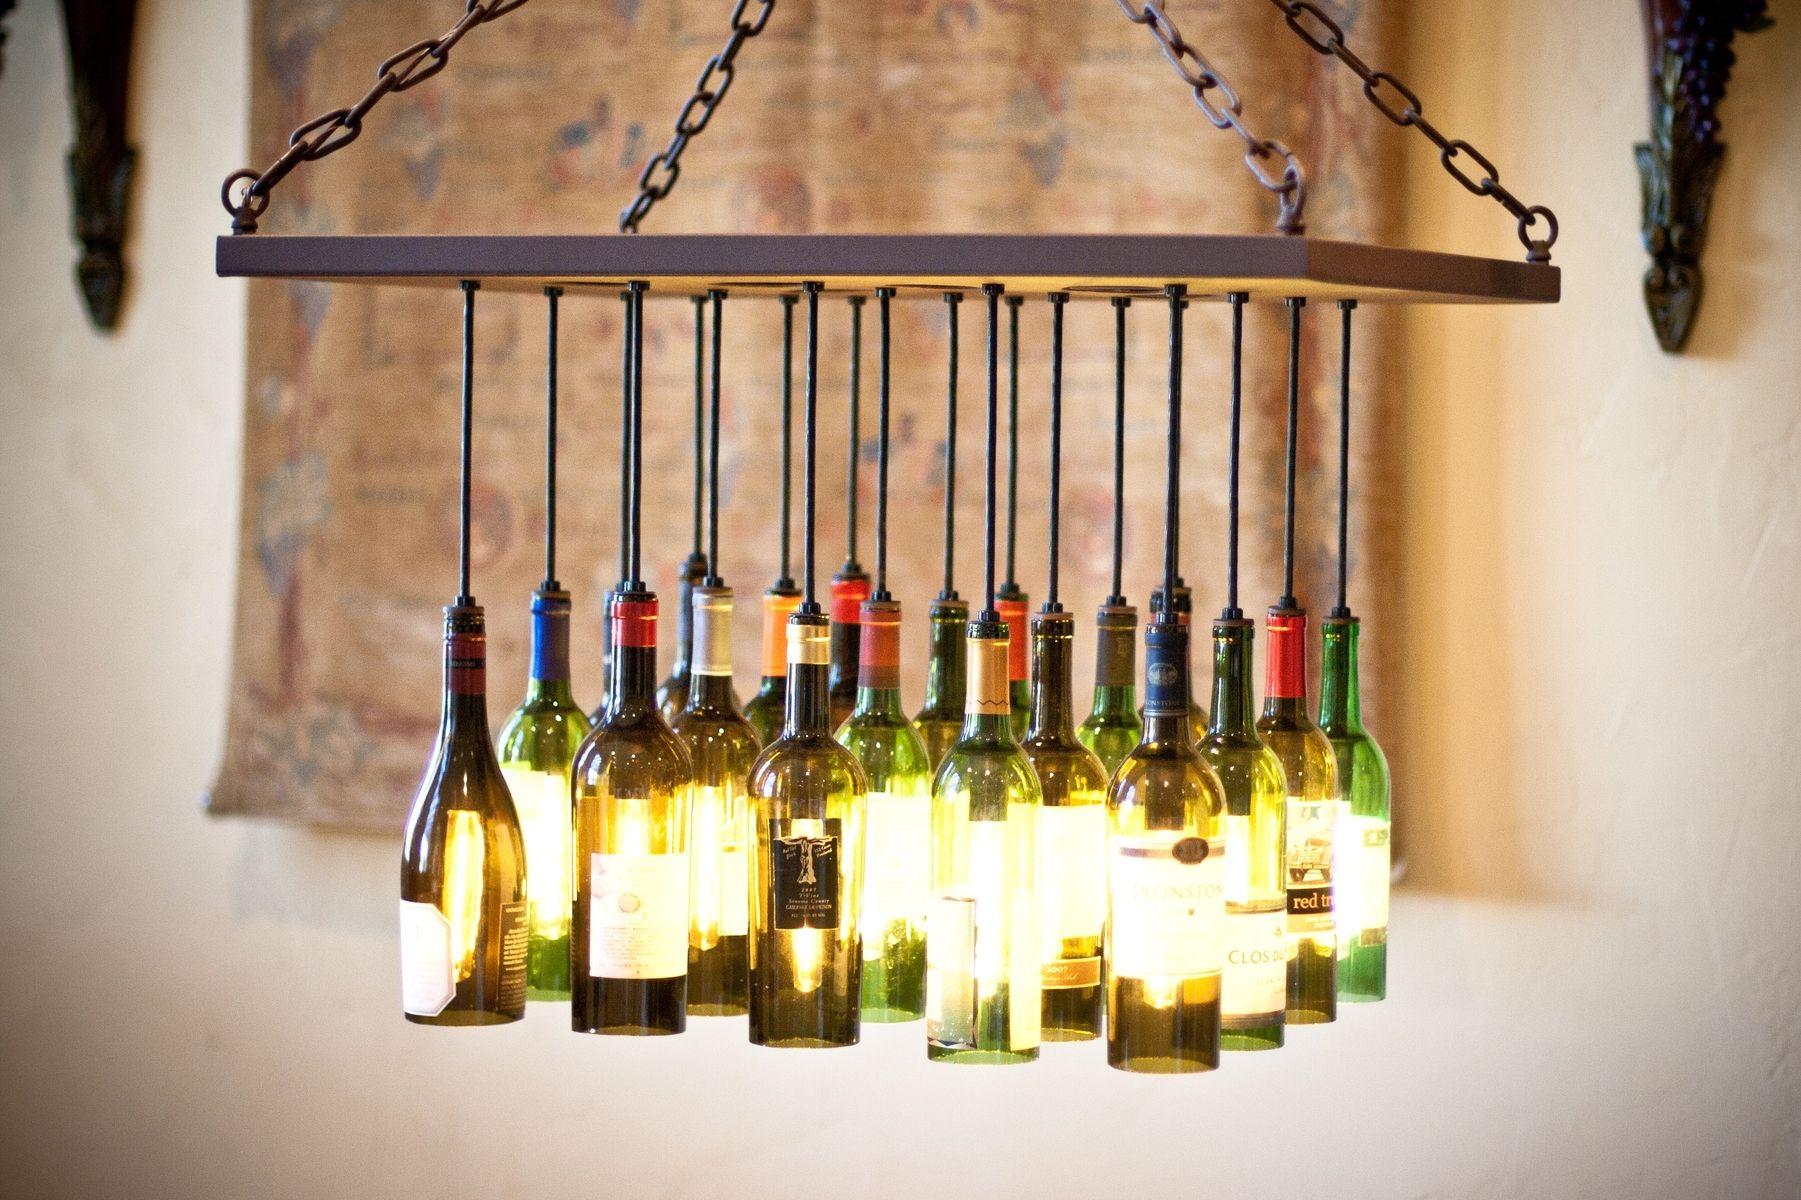 Empty wine bottles repurposed into light fittings